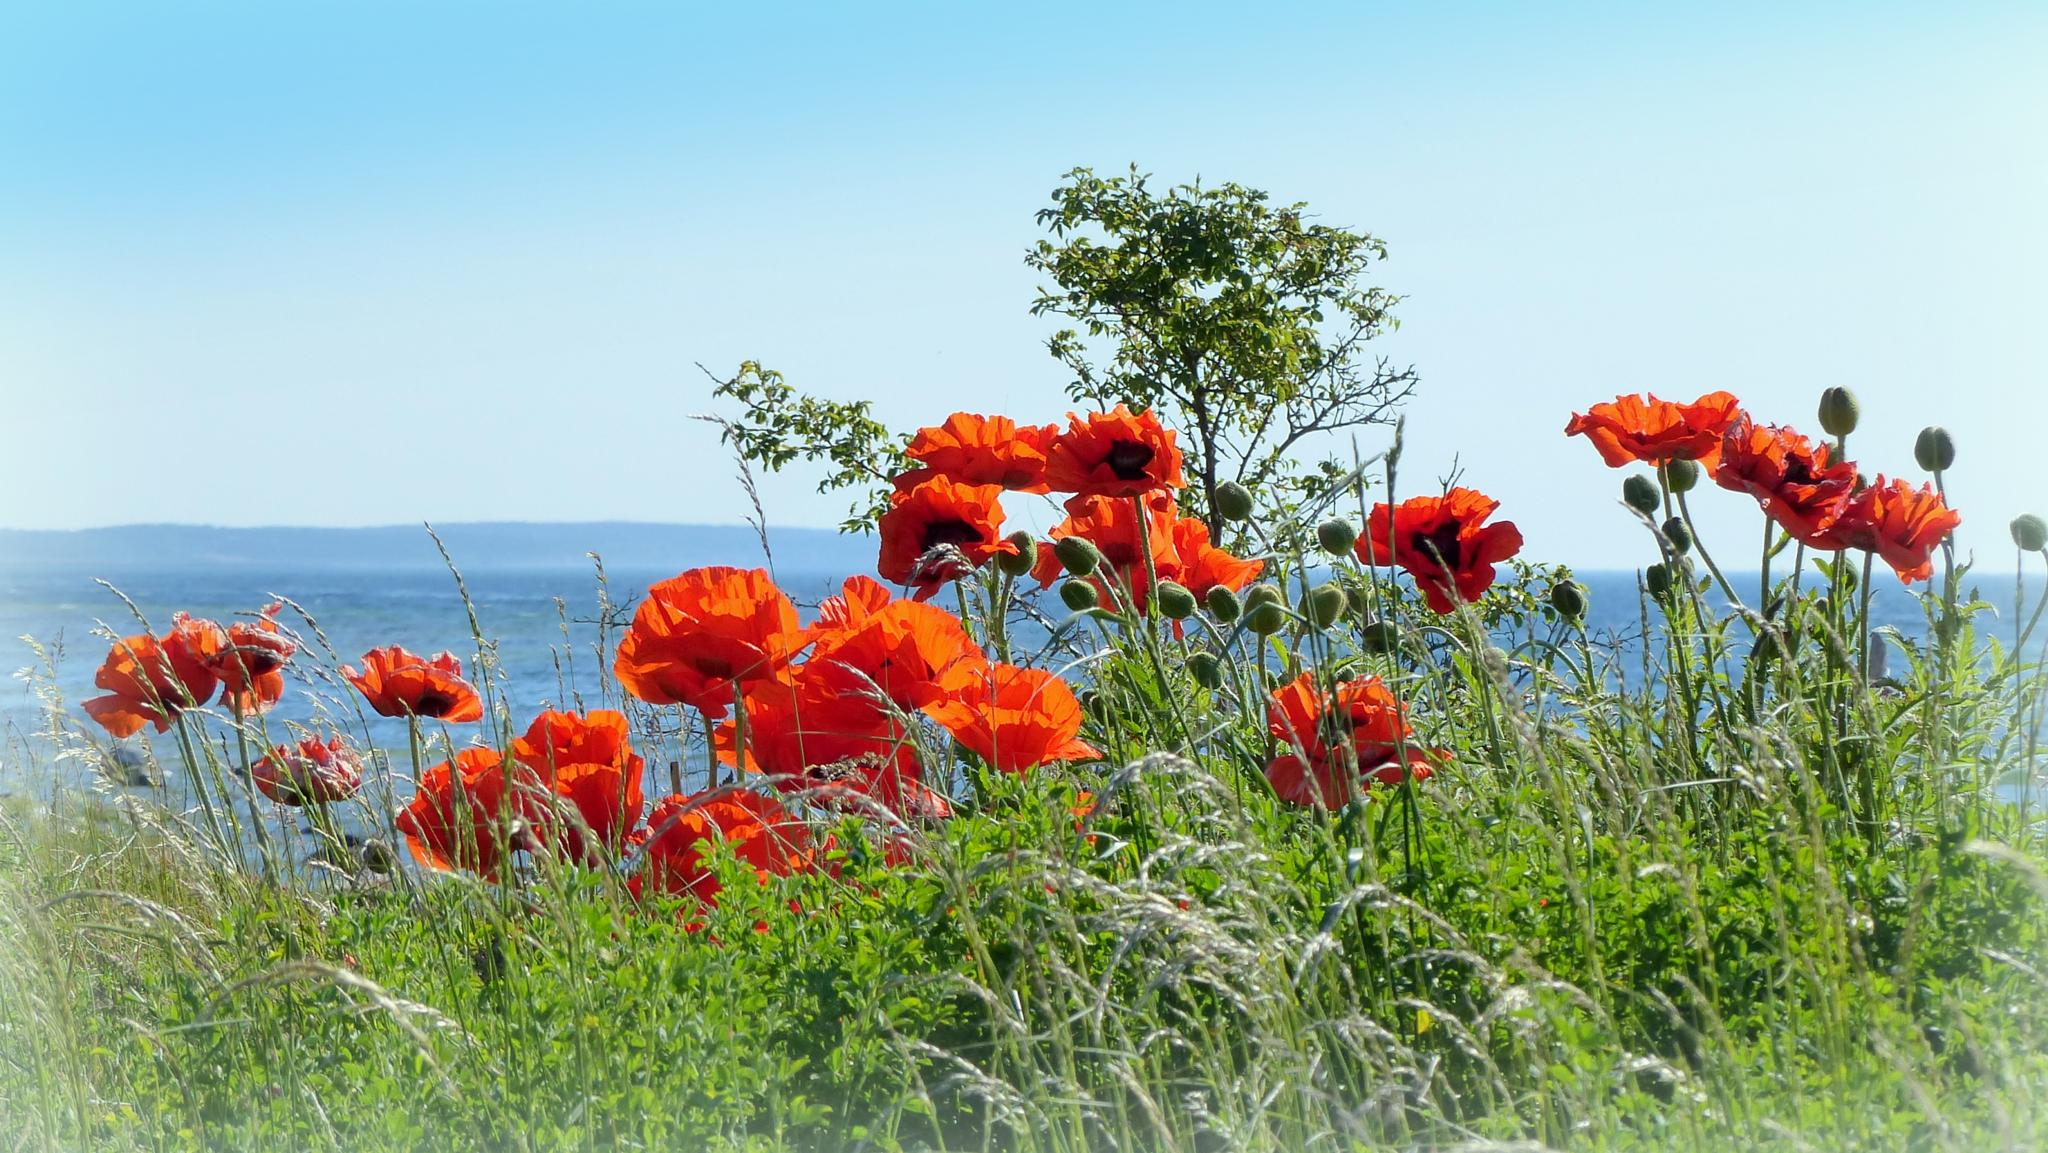 Poppies by the Baltic sea by maja.e.olin